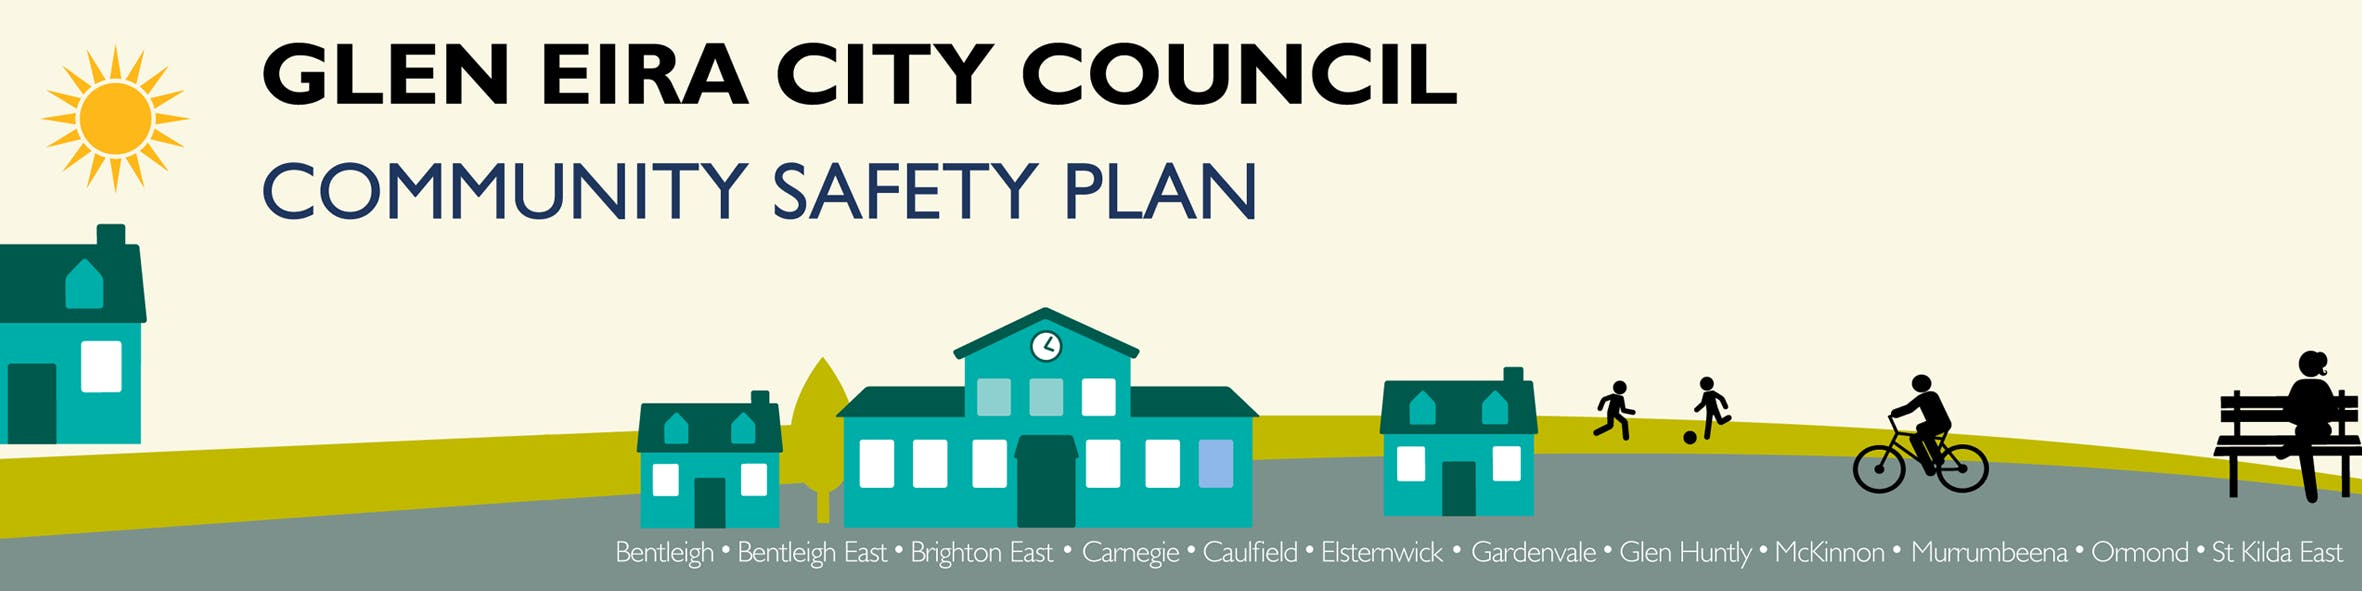 Community Safety Plan